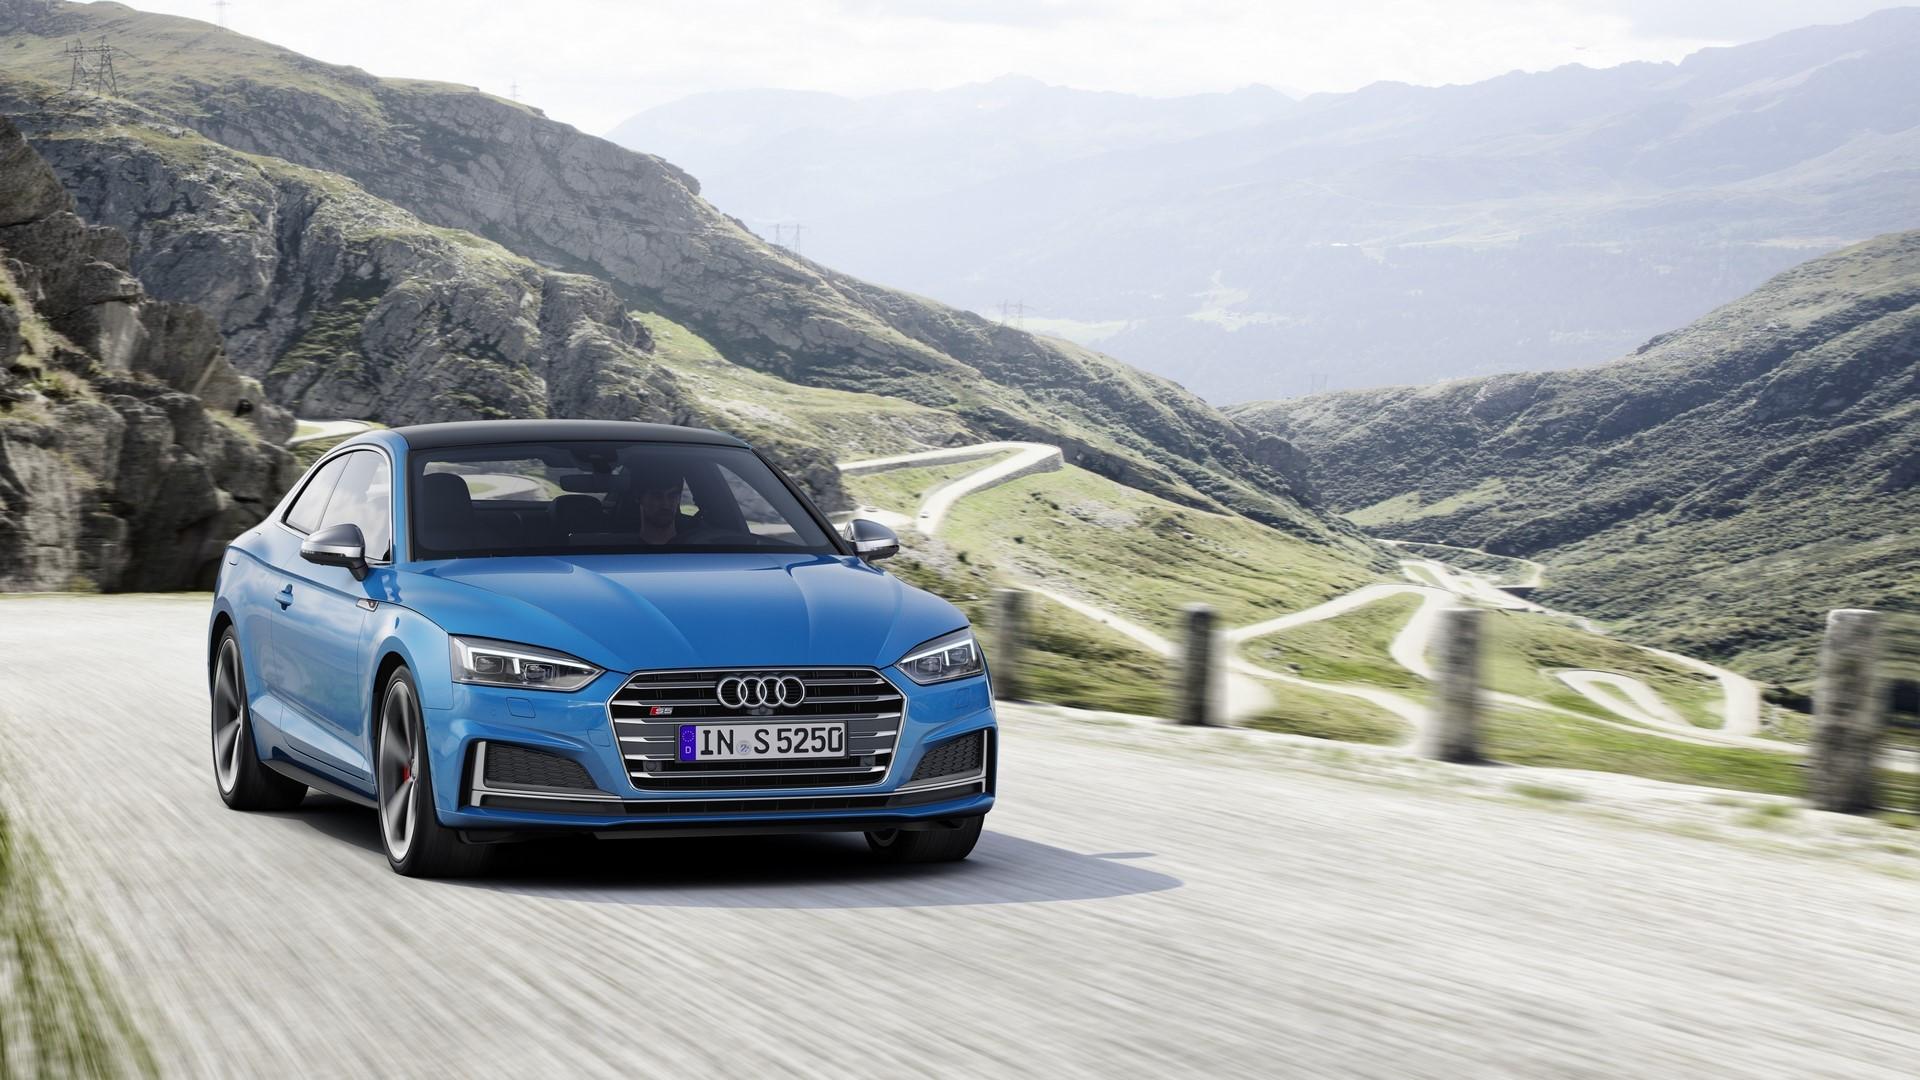 Audi-S5-TDI-Coupe-11